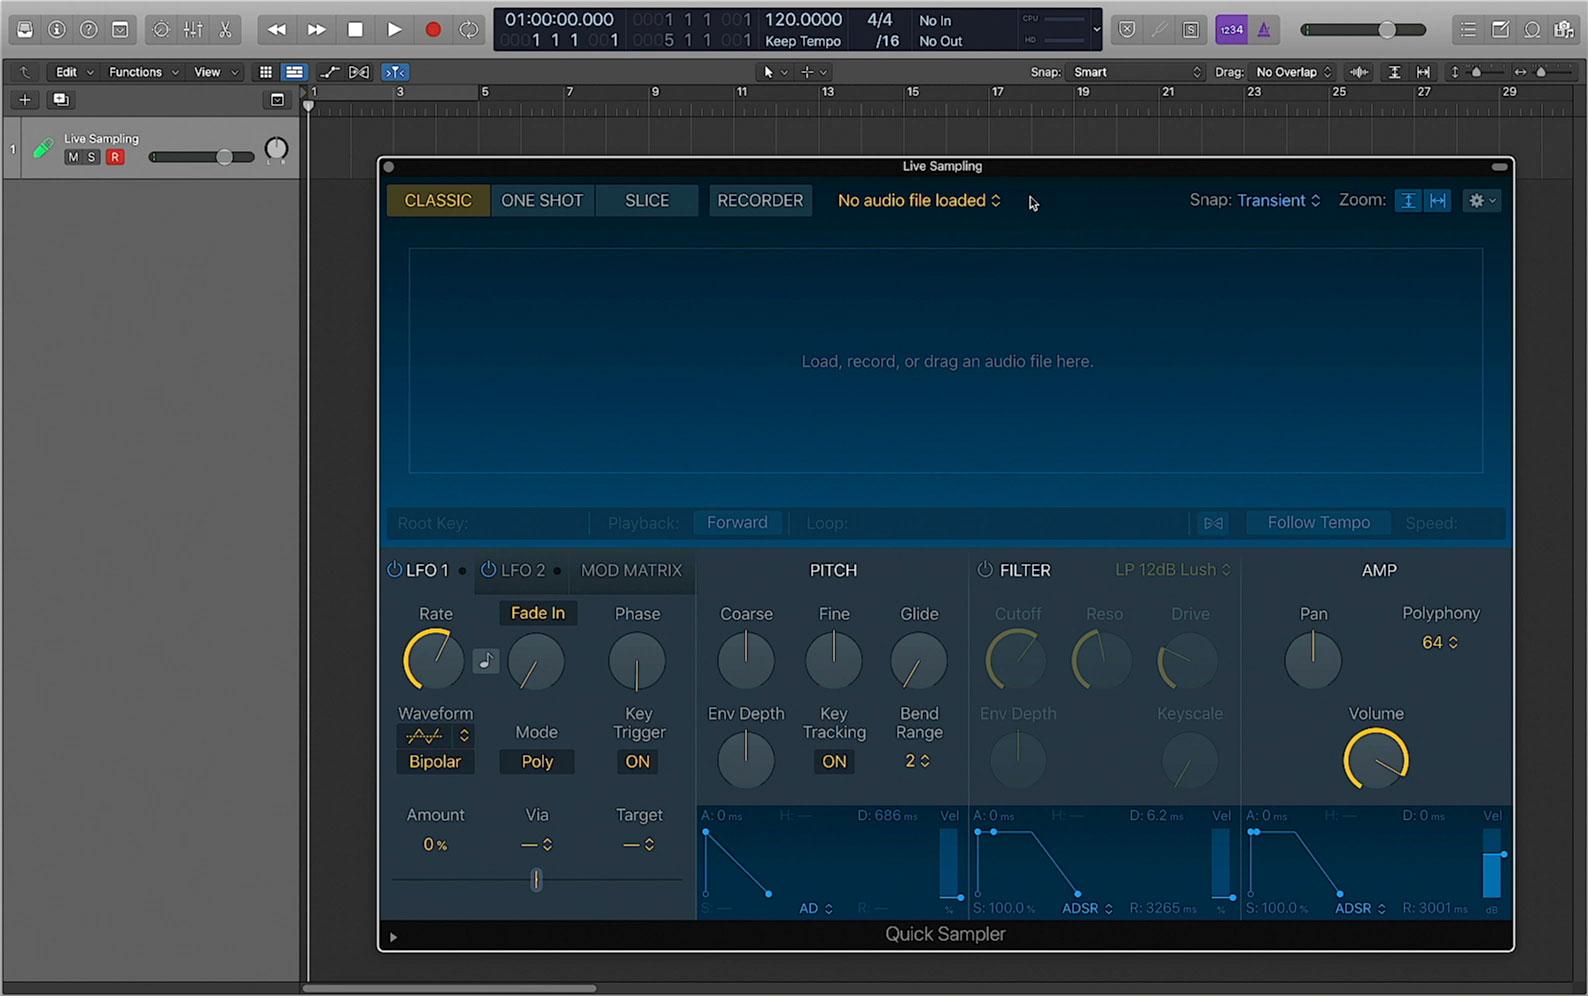 Logic Pro X 10.5 Quick Sampler